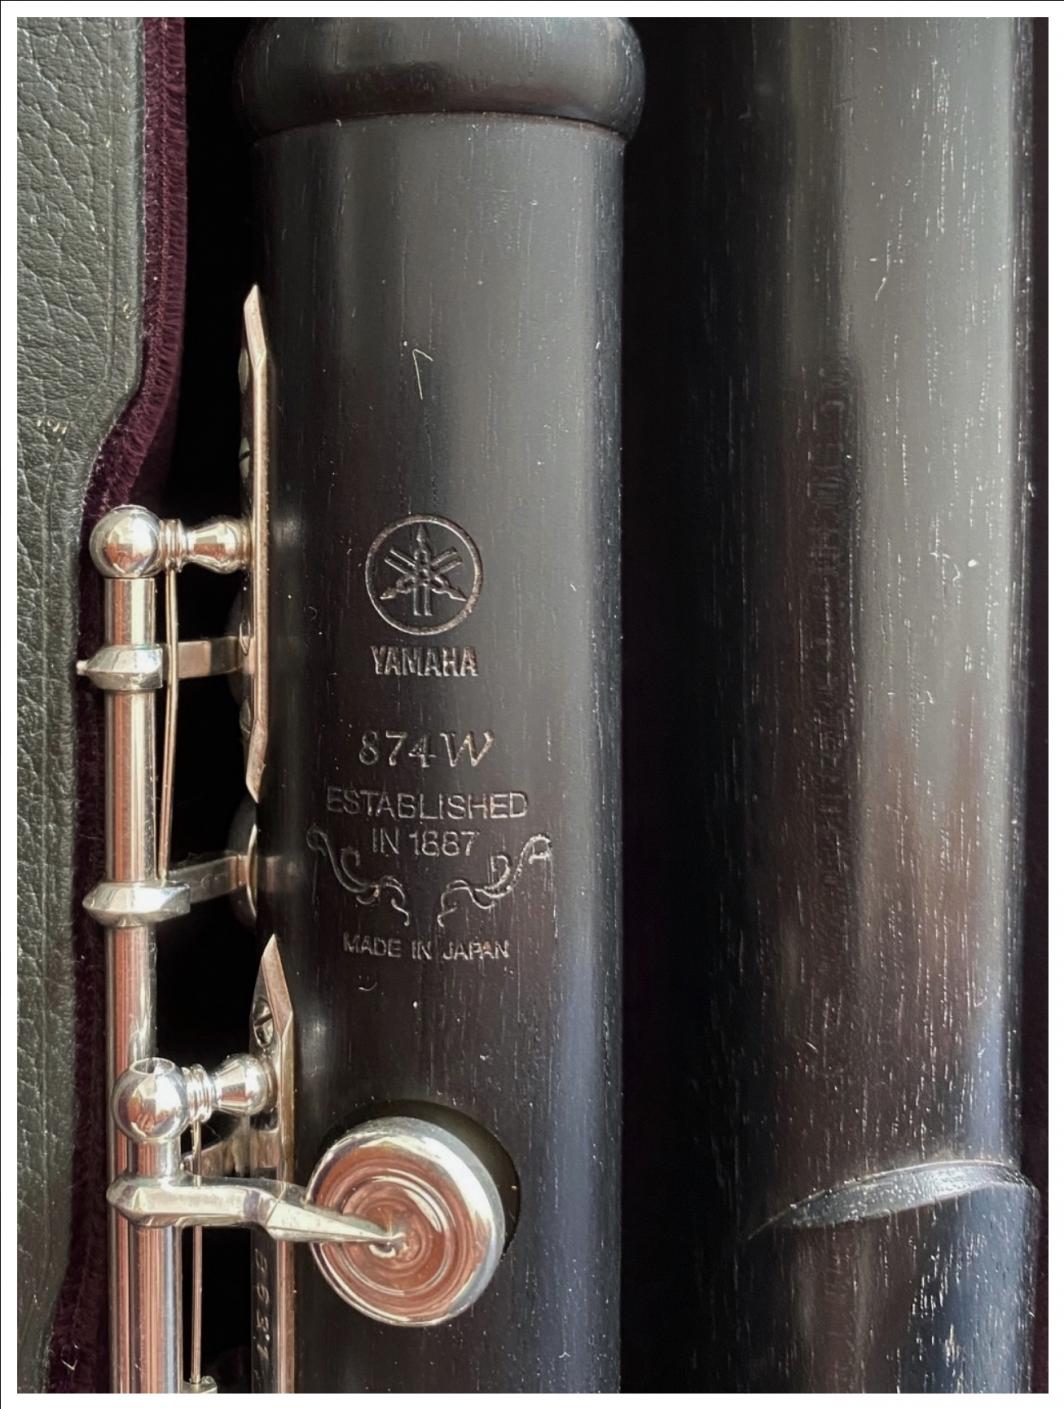 Yamaha 874W wooden Flute - Open Holes, Split E, B-Foot